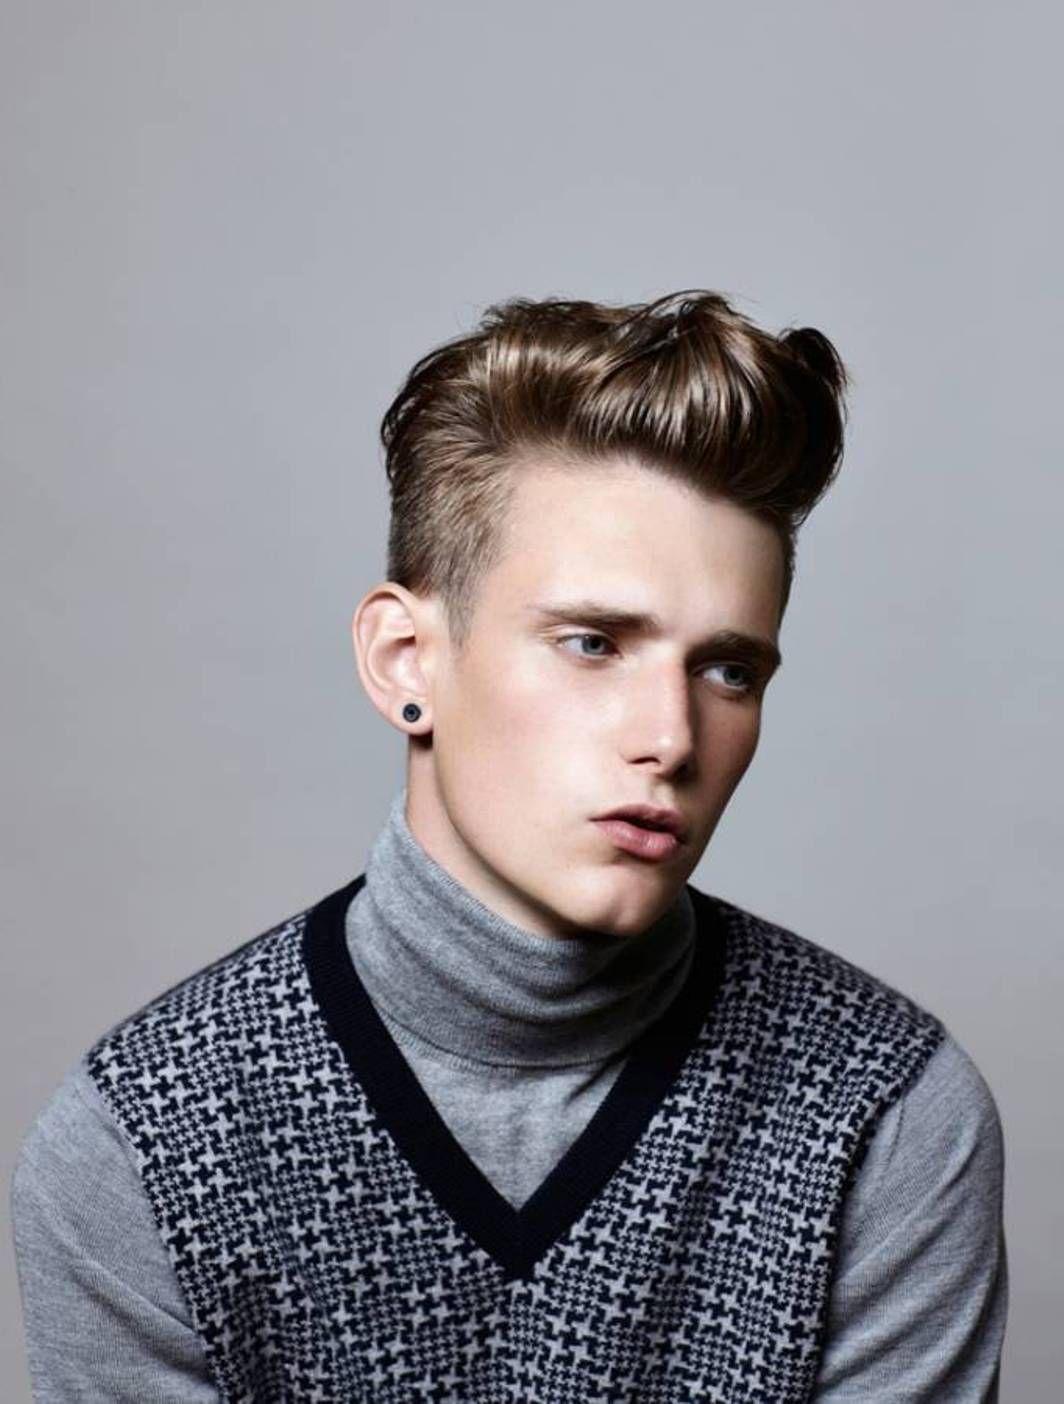 Short Gelled Hairstyles For Men | Hair | Hair styles, Hair cuts, New ...